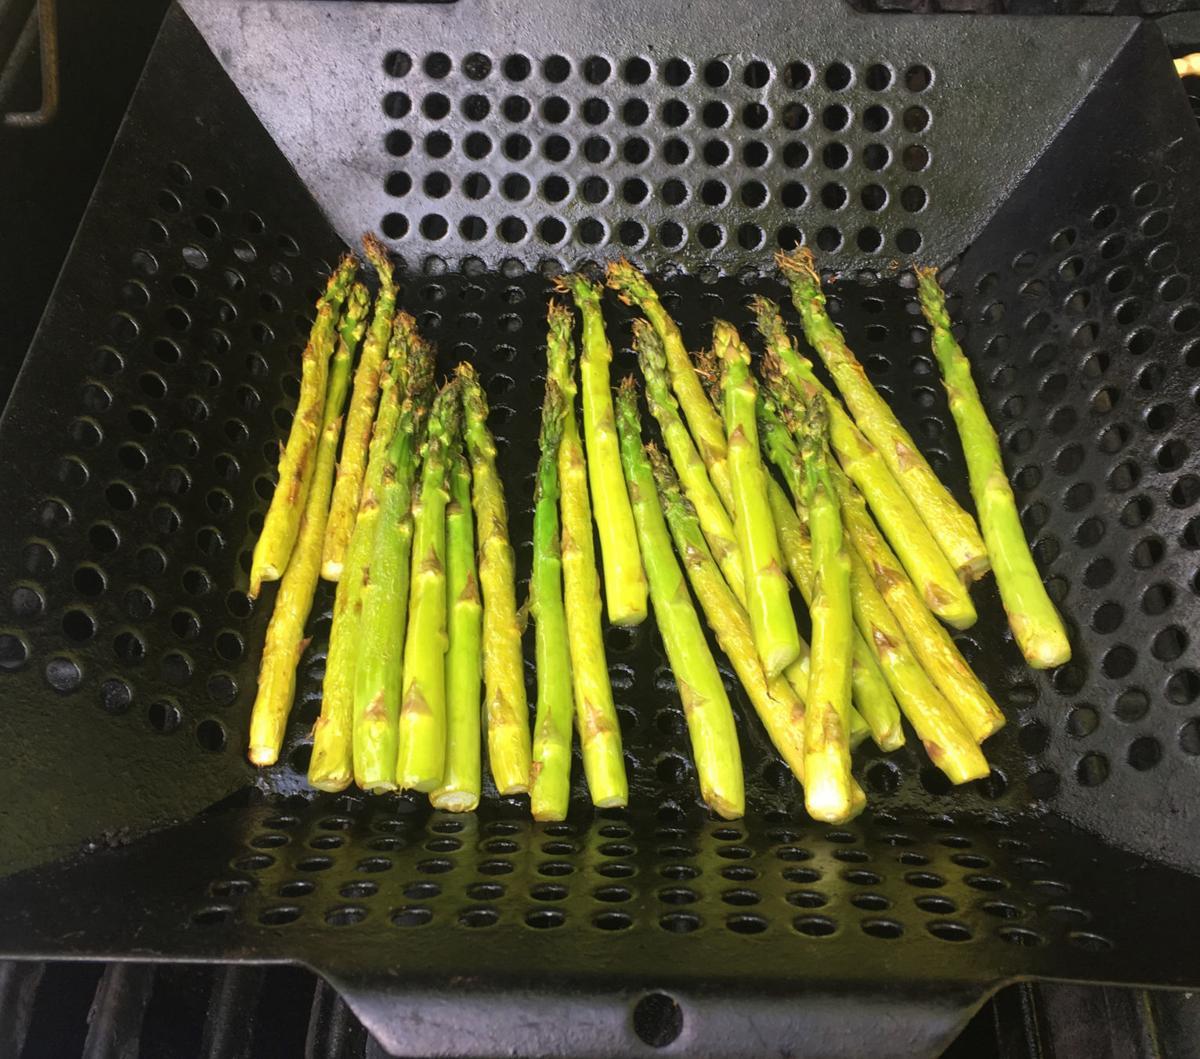 grilling asparagus.jpg